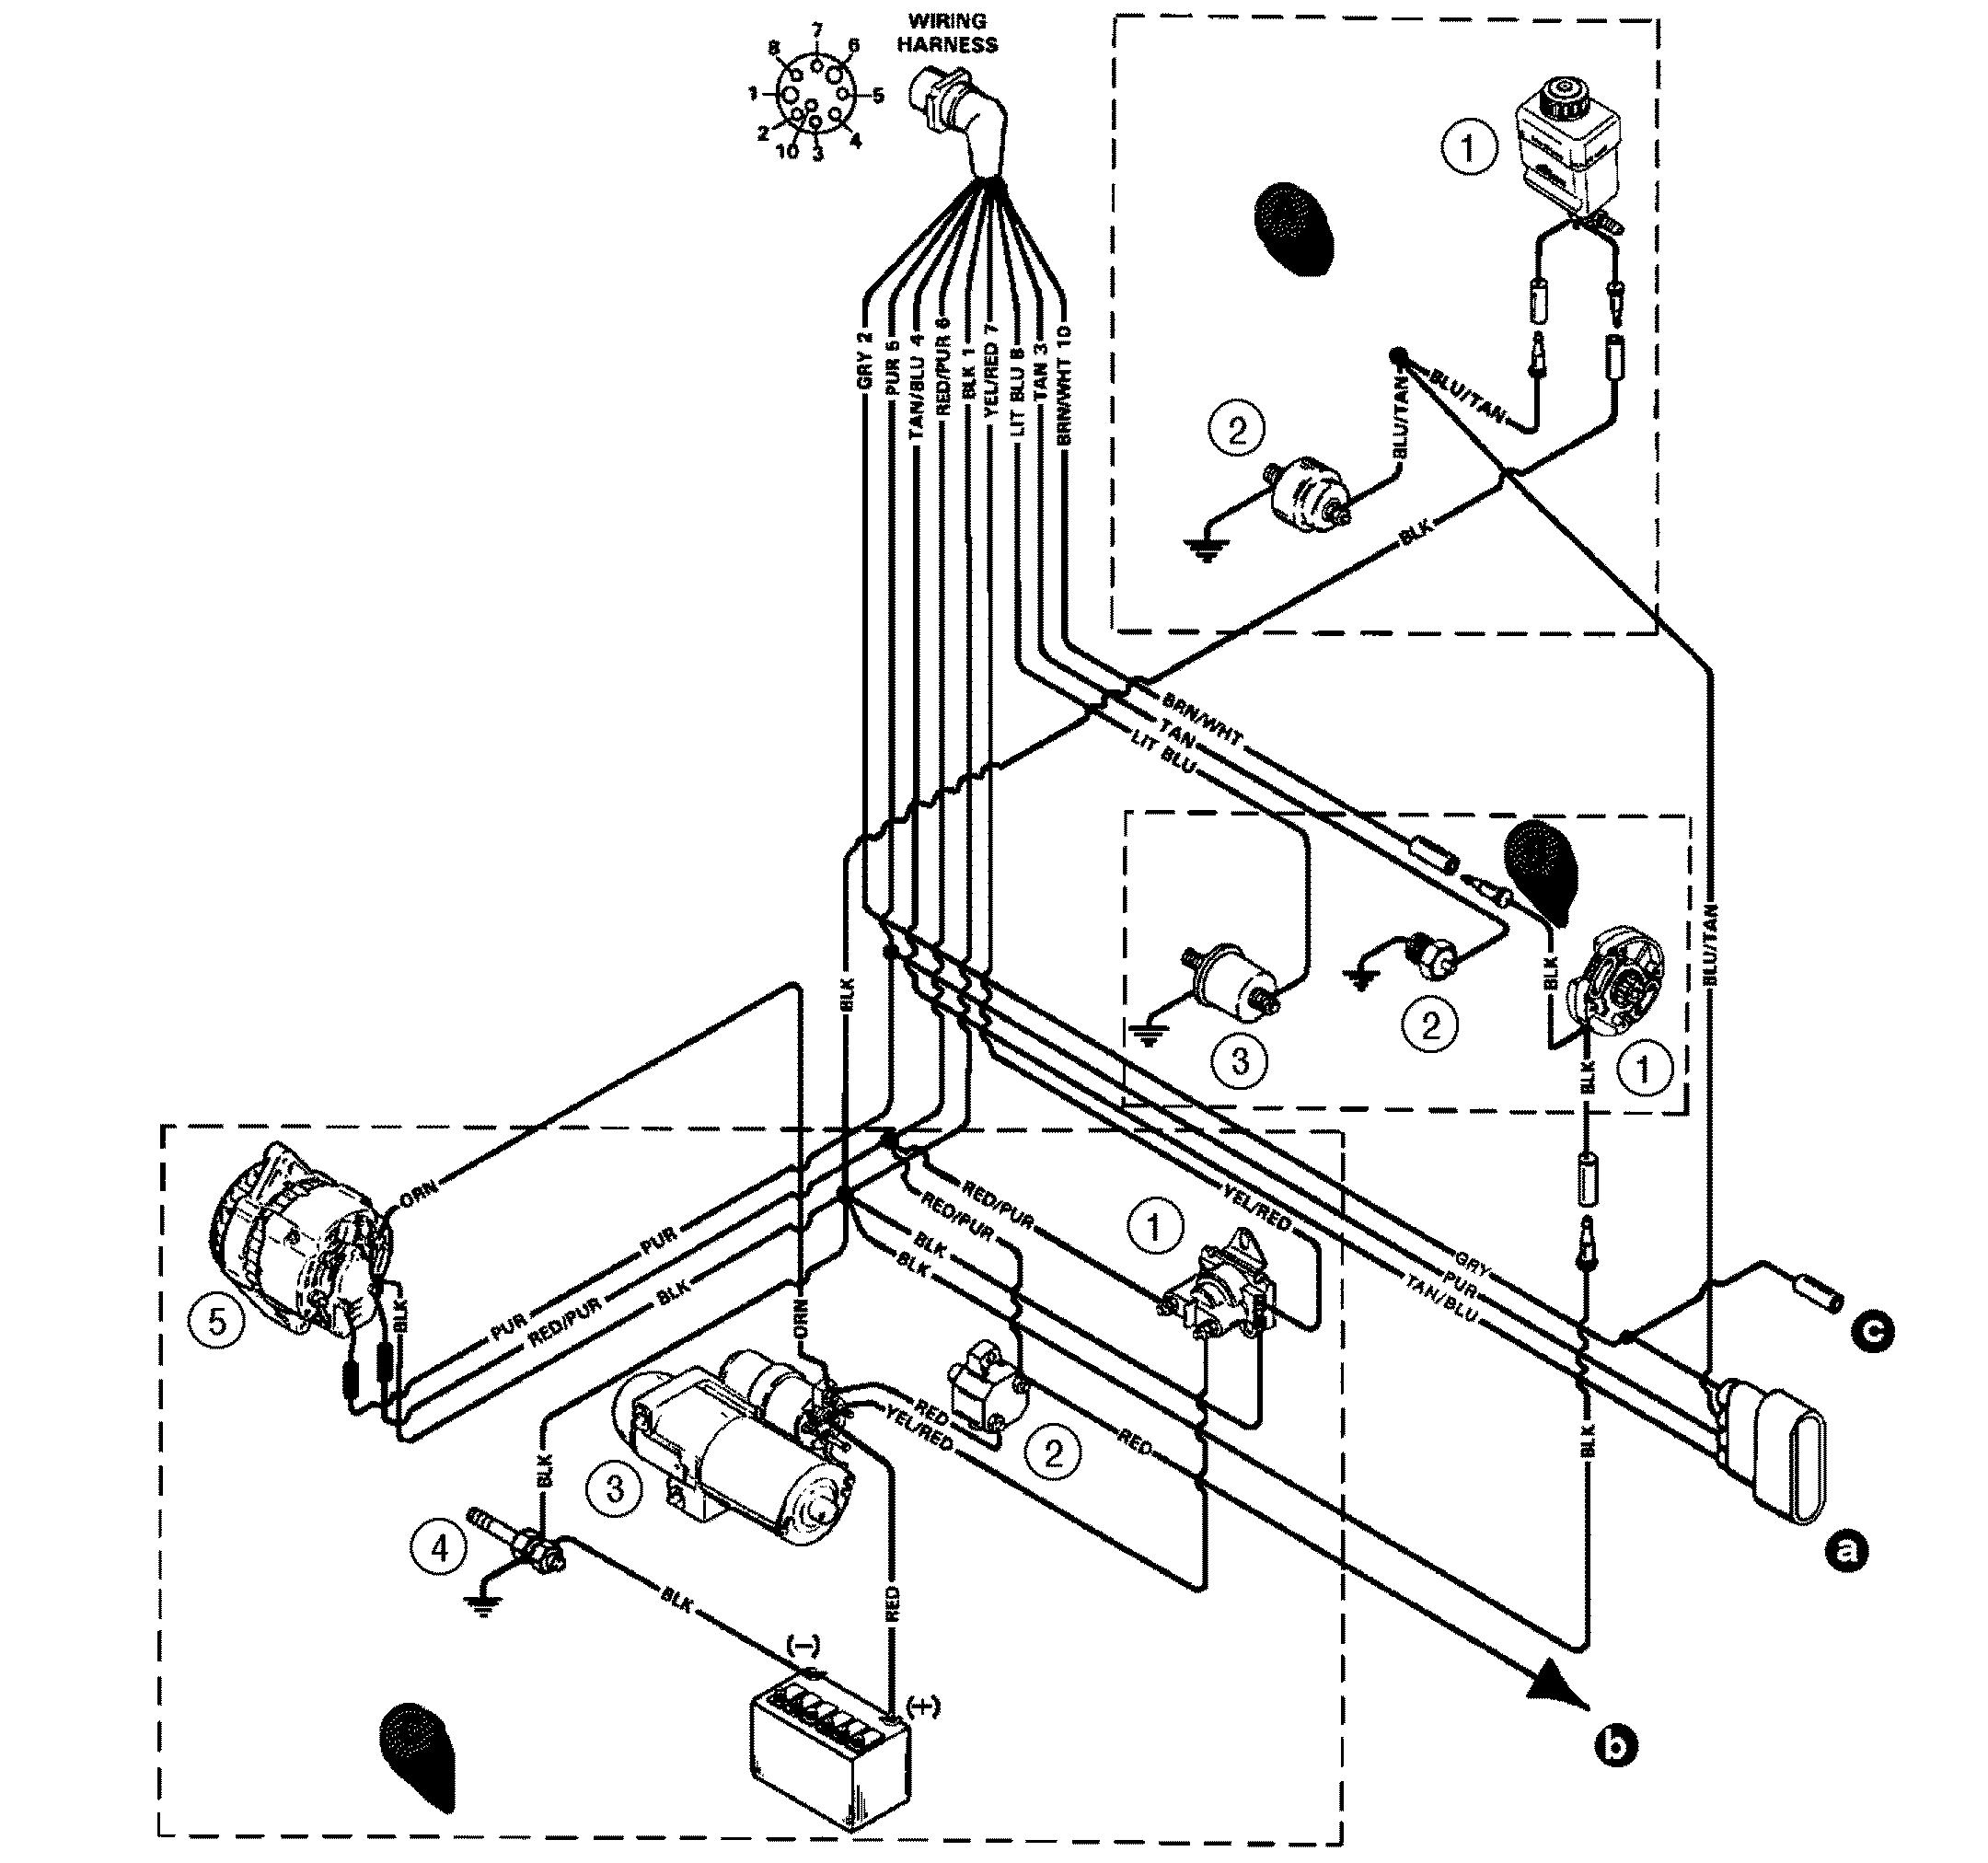 Wiring Diagram For Mercruiser 4 3